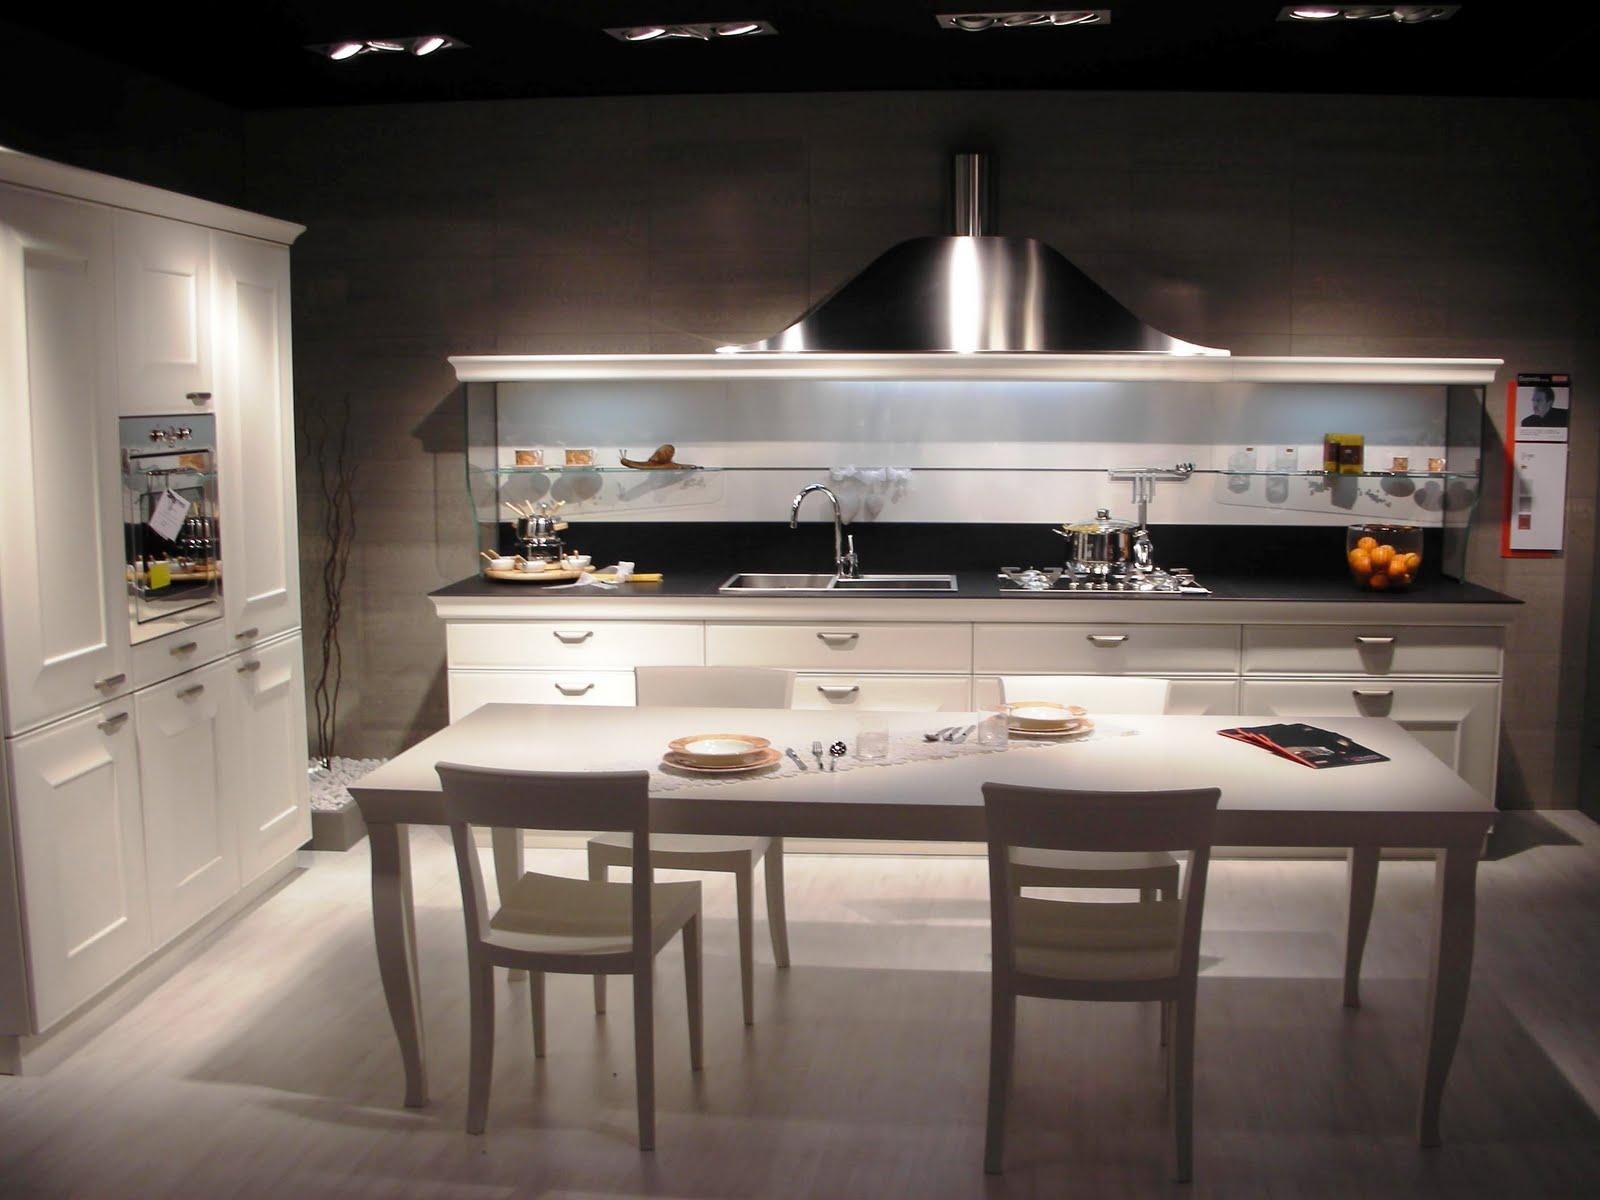 Rudy s blog over italiaanse design keukens e d italiaanse landhuiskeuken gioconda design van - Designer keuken ...